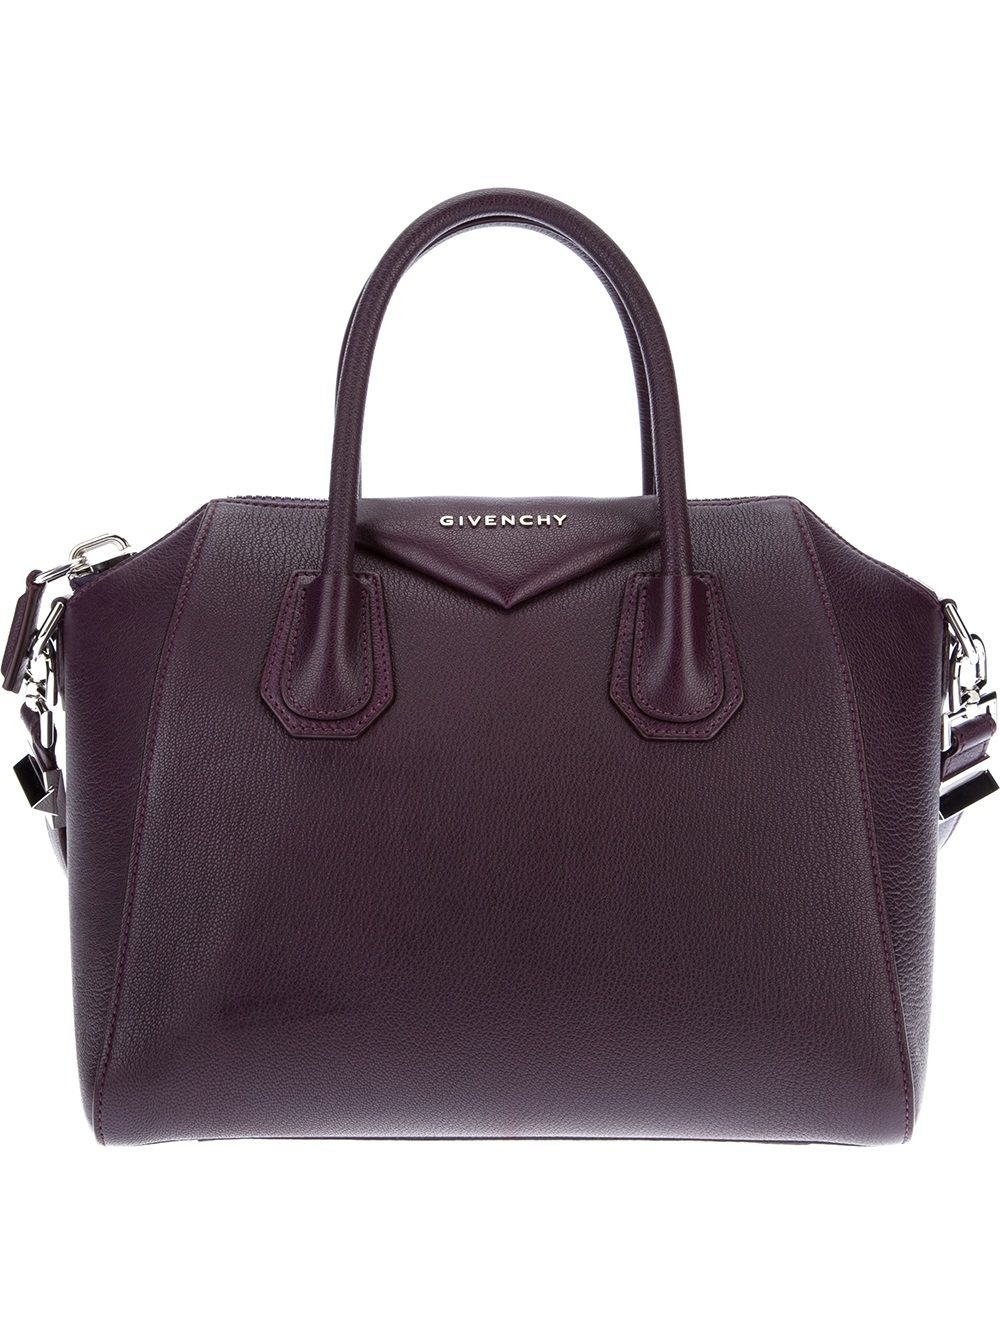 e14f67596a8 Women s Purple Antigona Small Leather Tote   Givenchy Bags ...